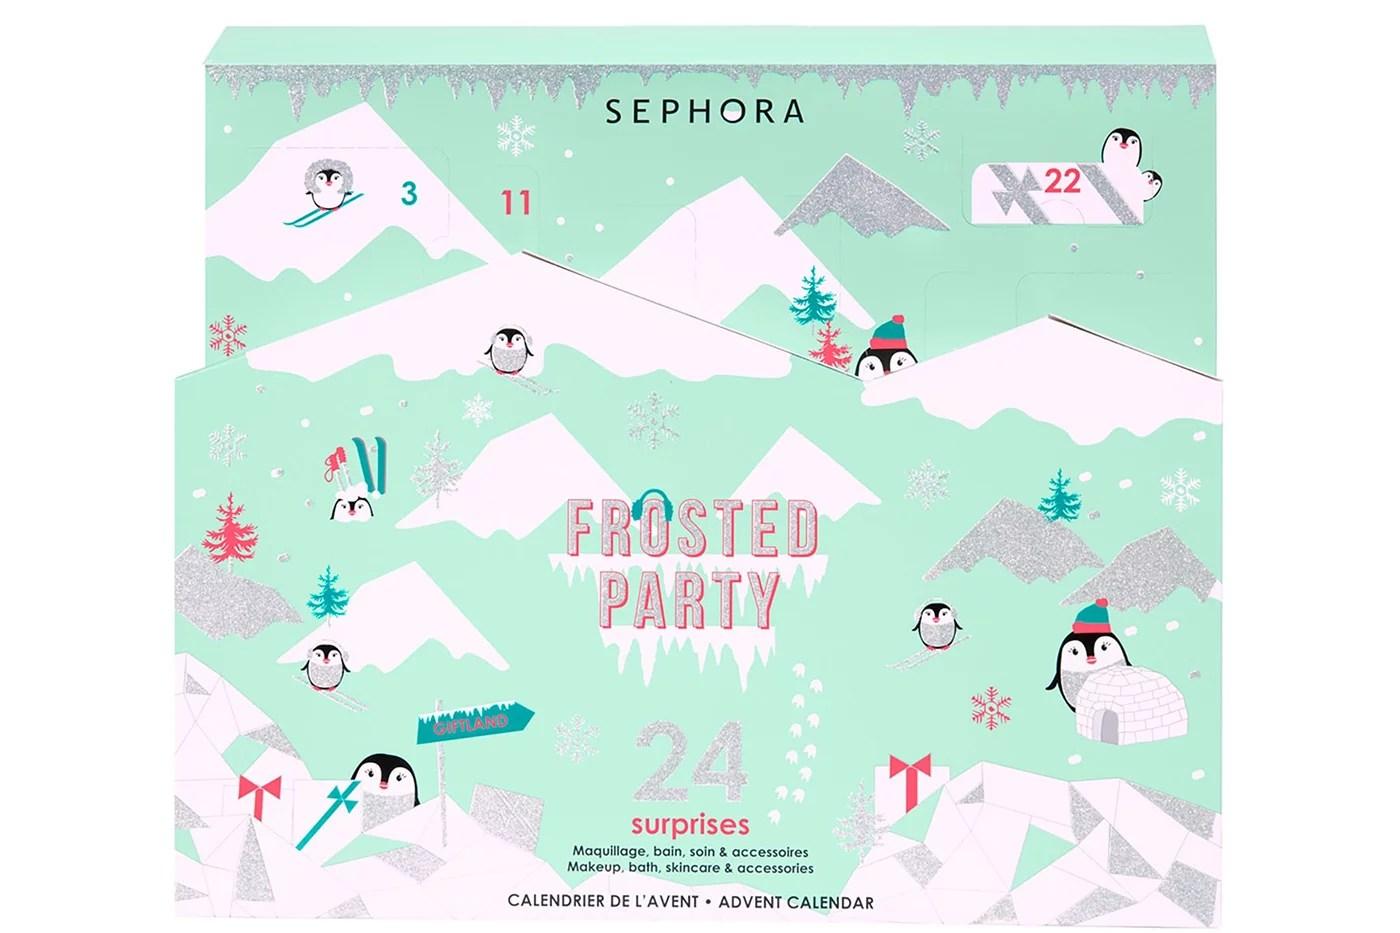 Calendrier De L Avent Sephora 2019 Frosted Party Code Promo Spoiler